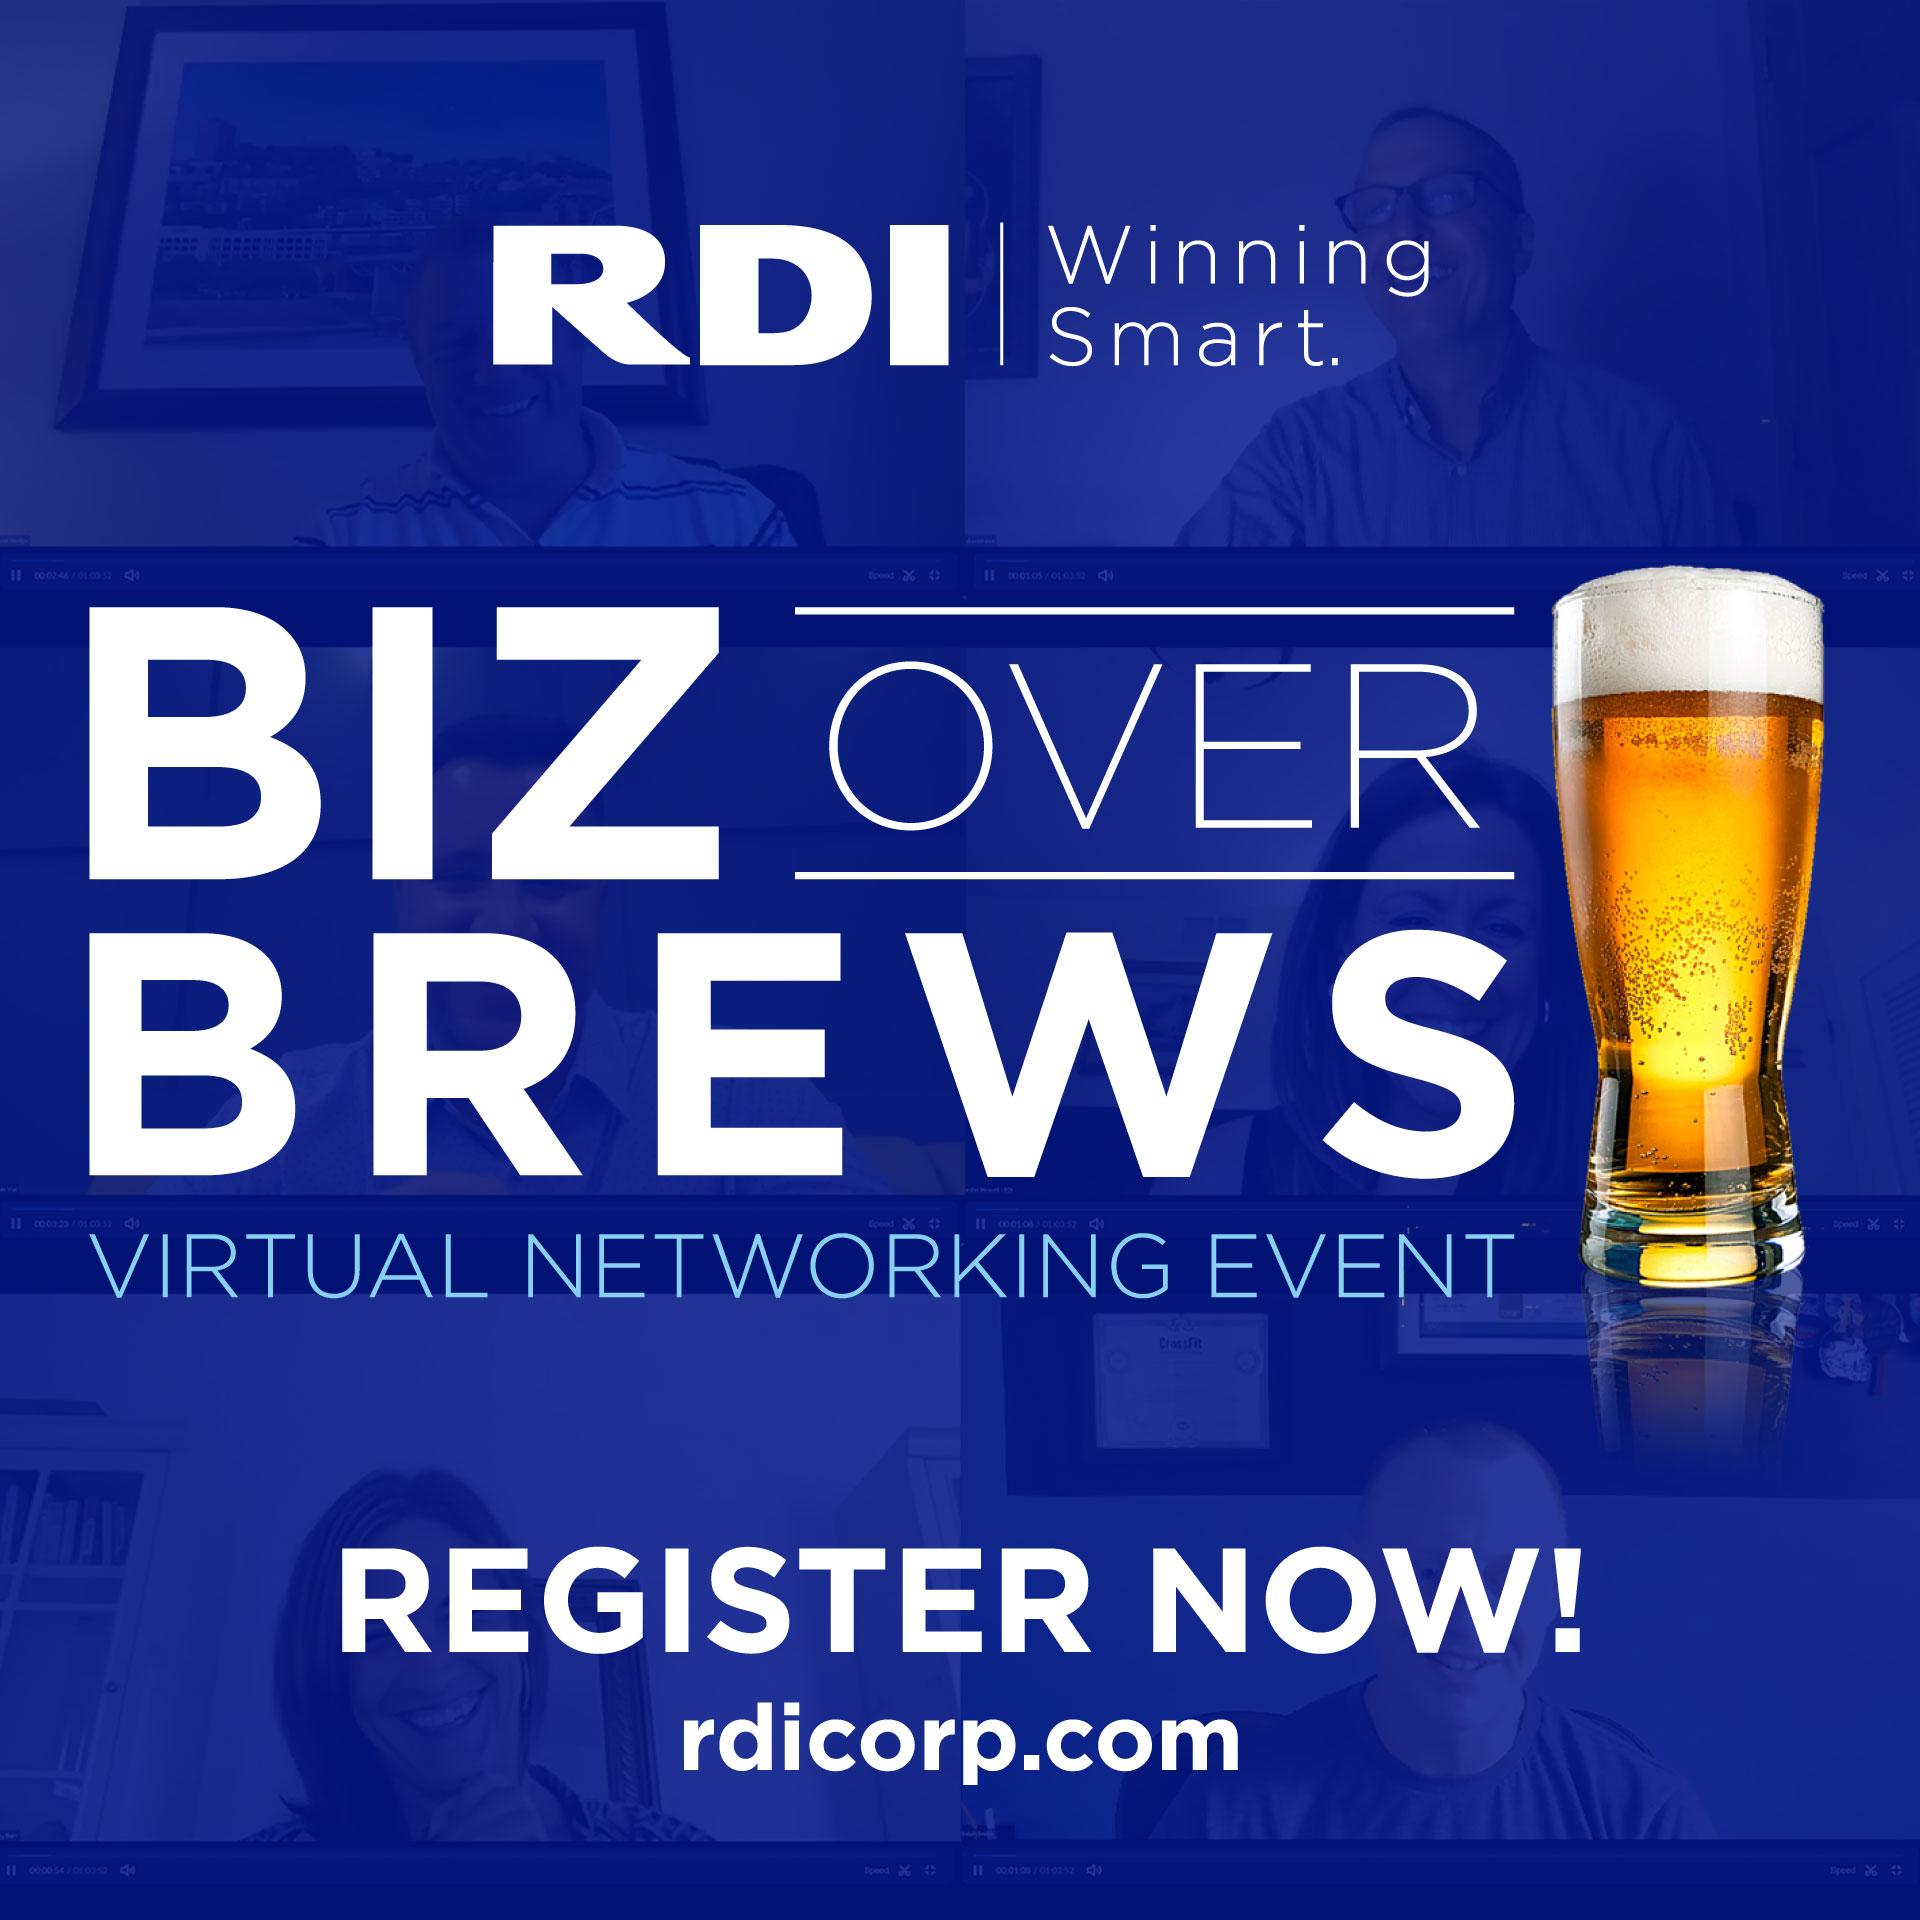 Biz Over Brews: Winning Smart